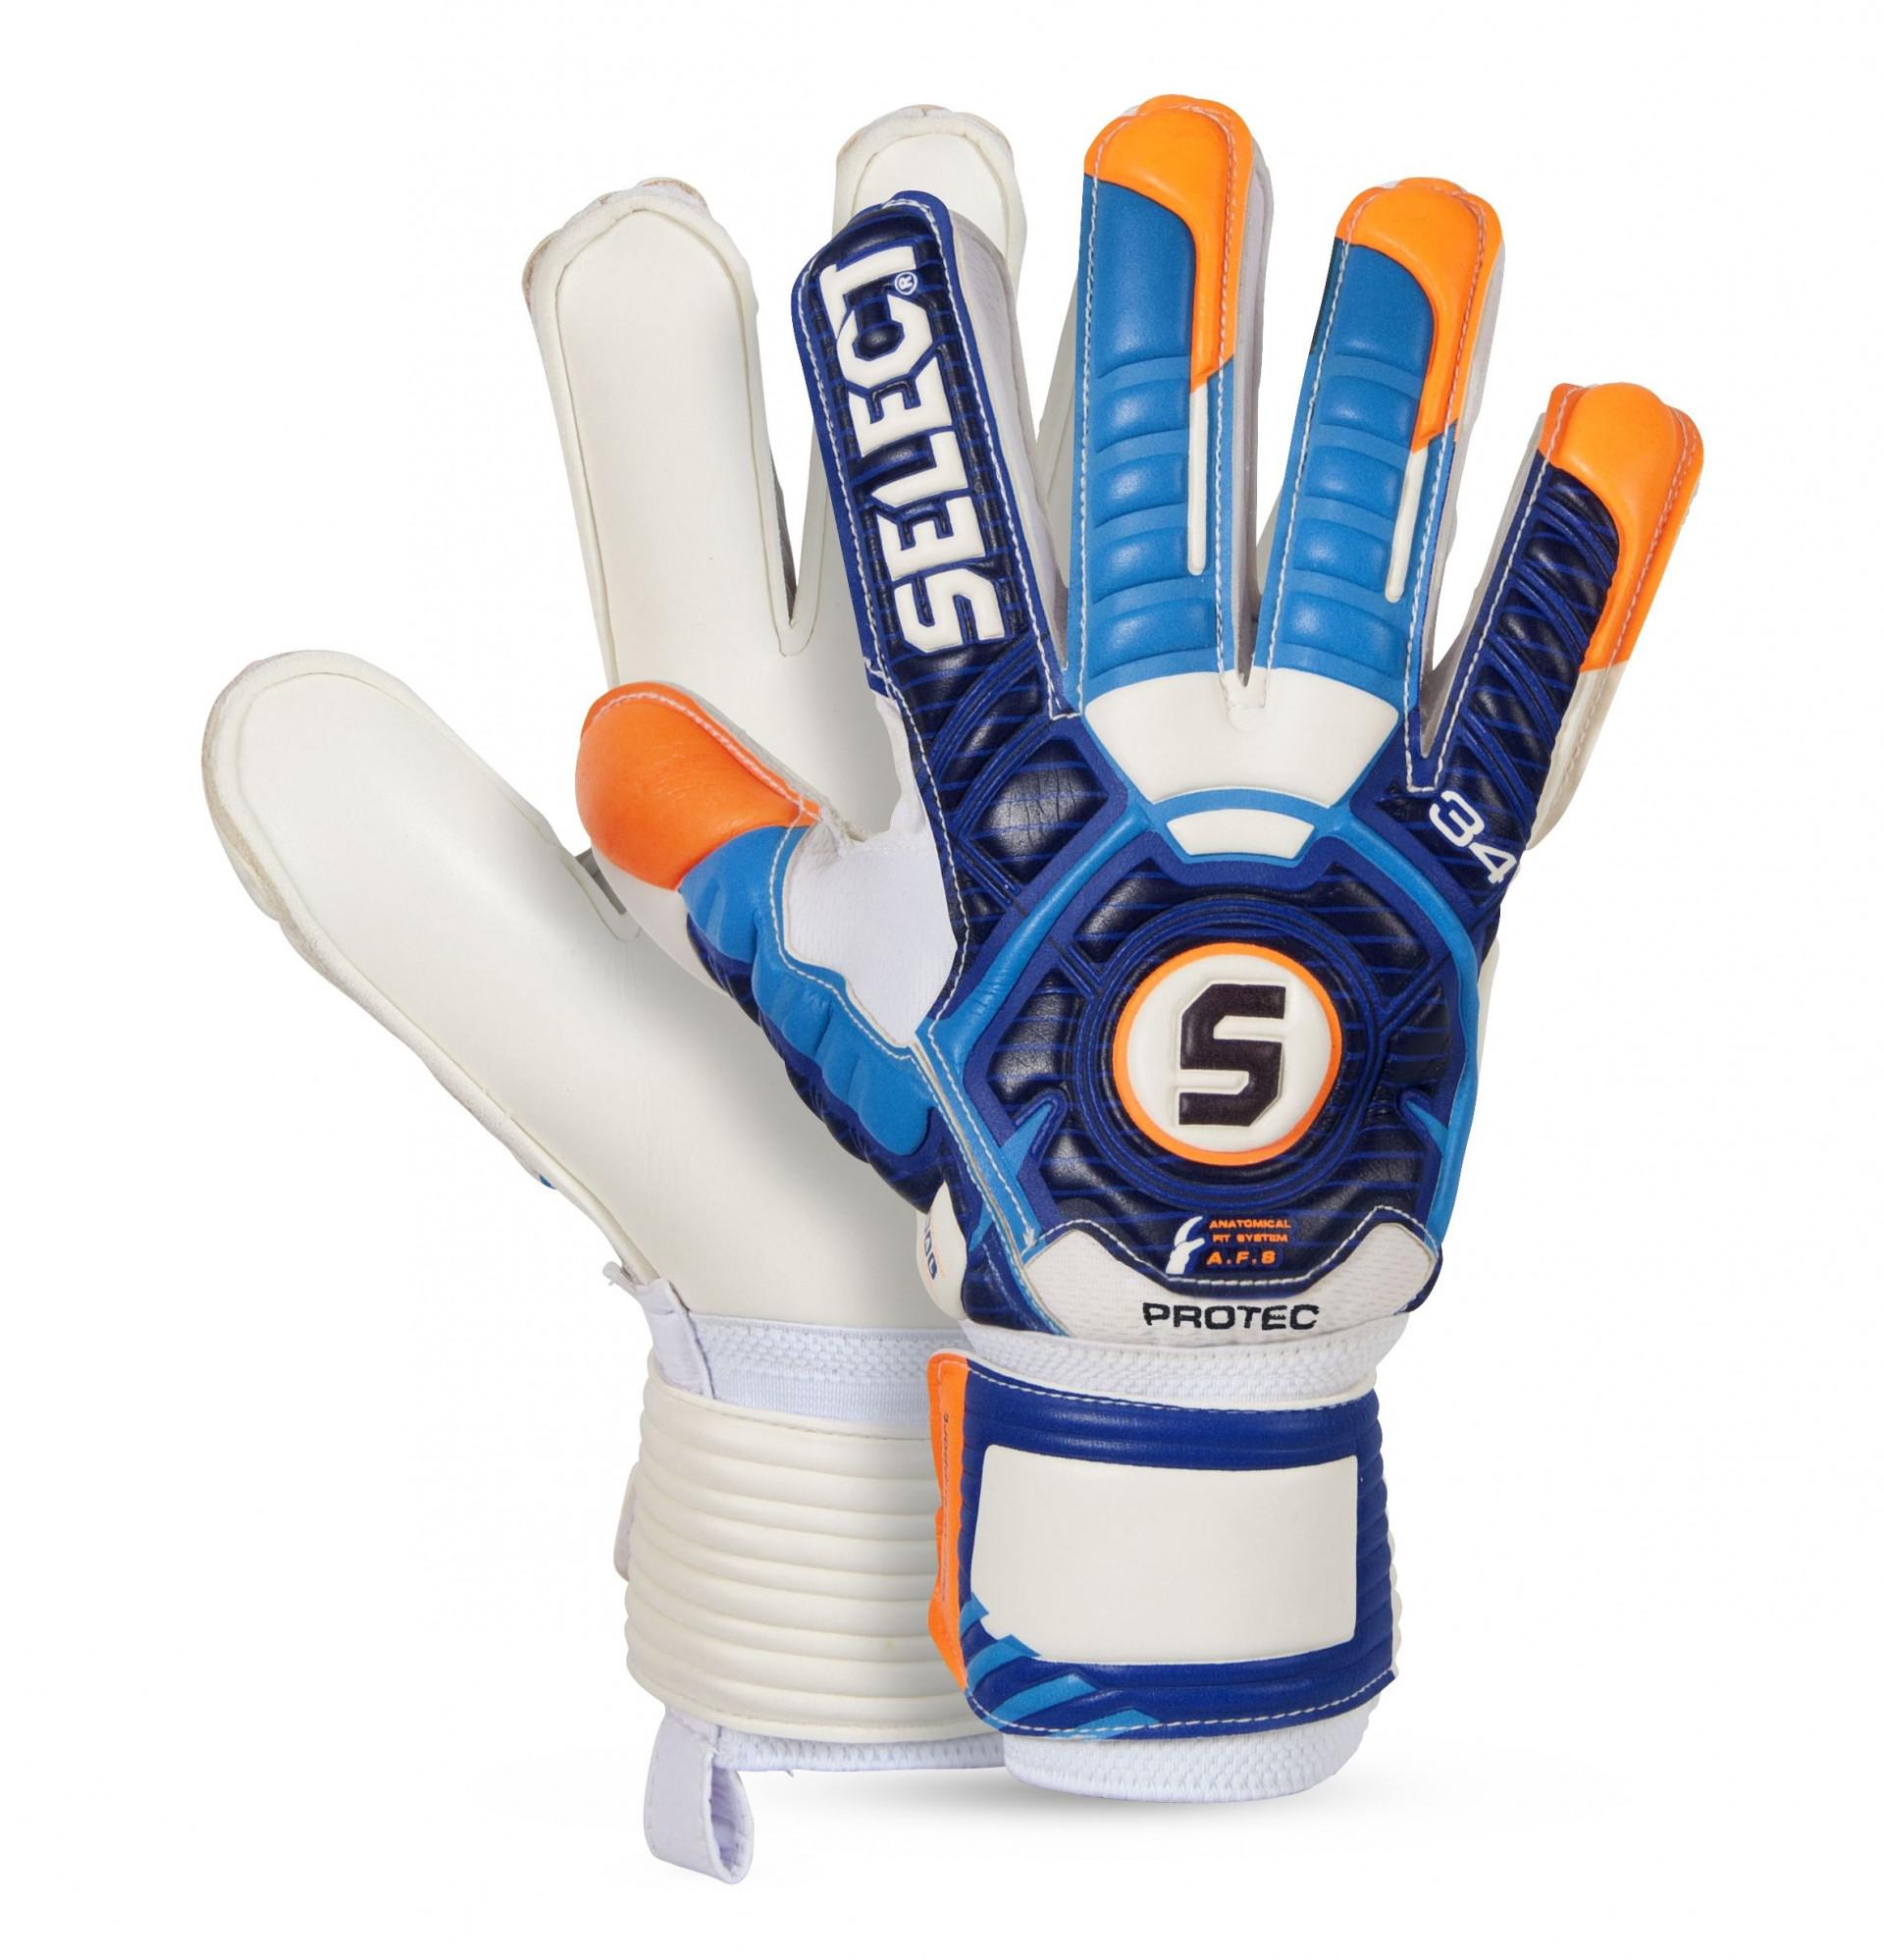 Ventes priv es gants de gardien 34 protec ventes priv es - Sport ventes privees ...